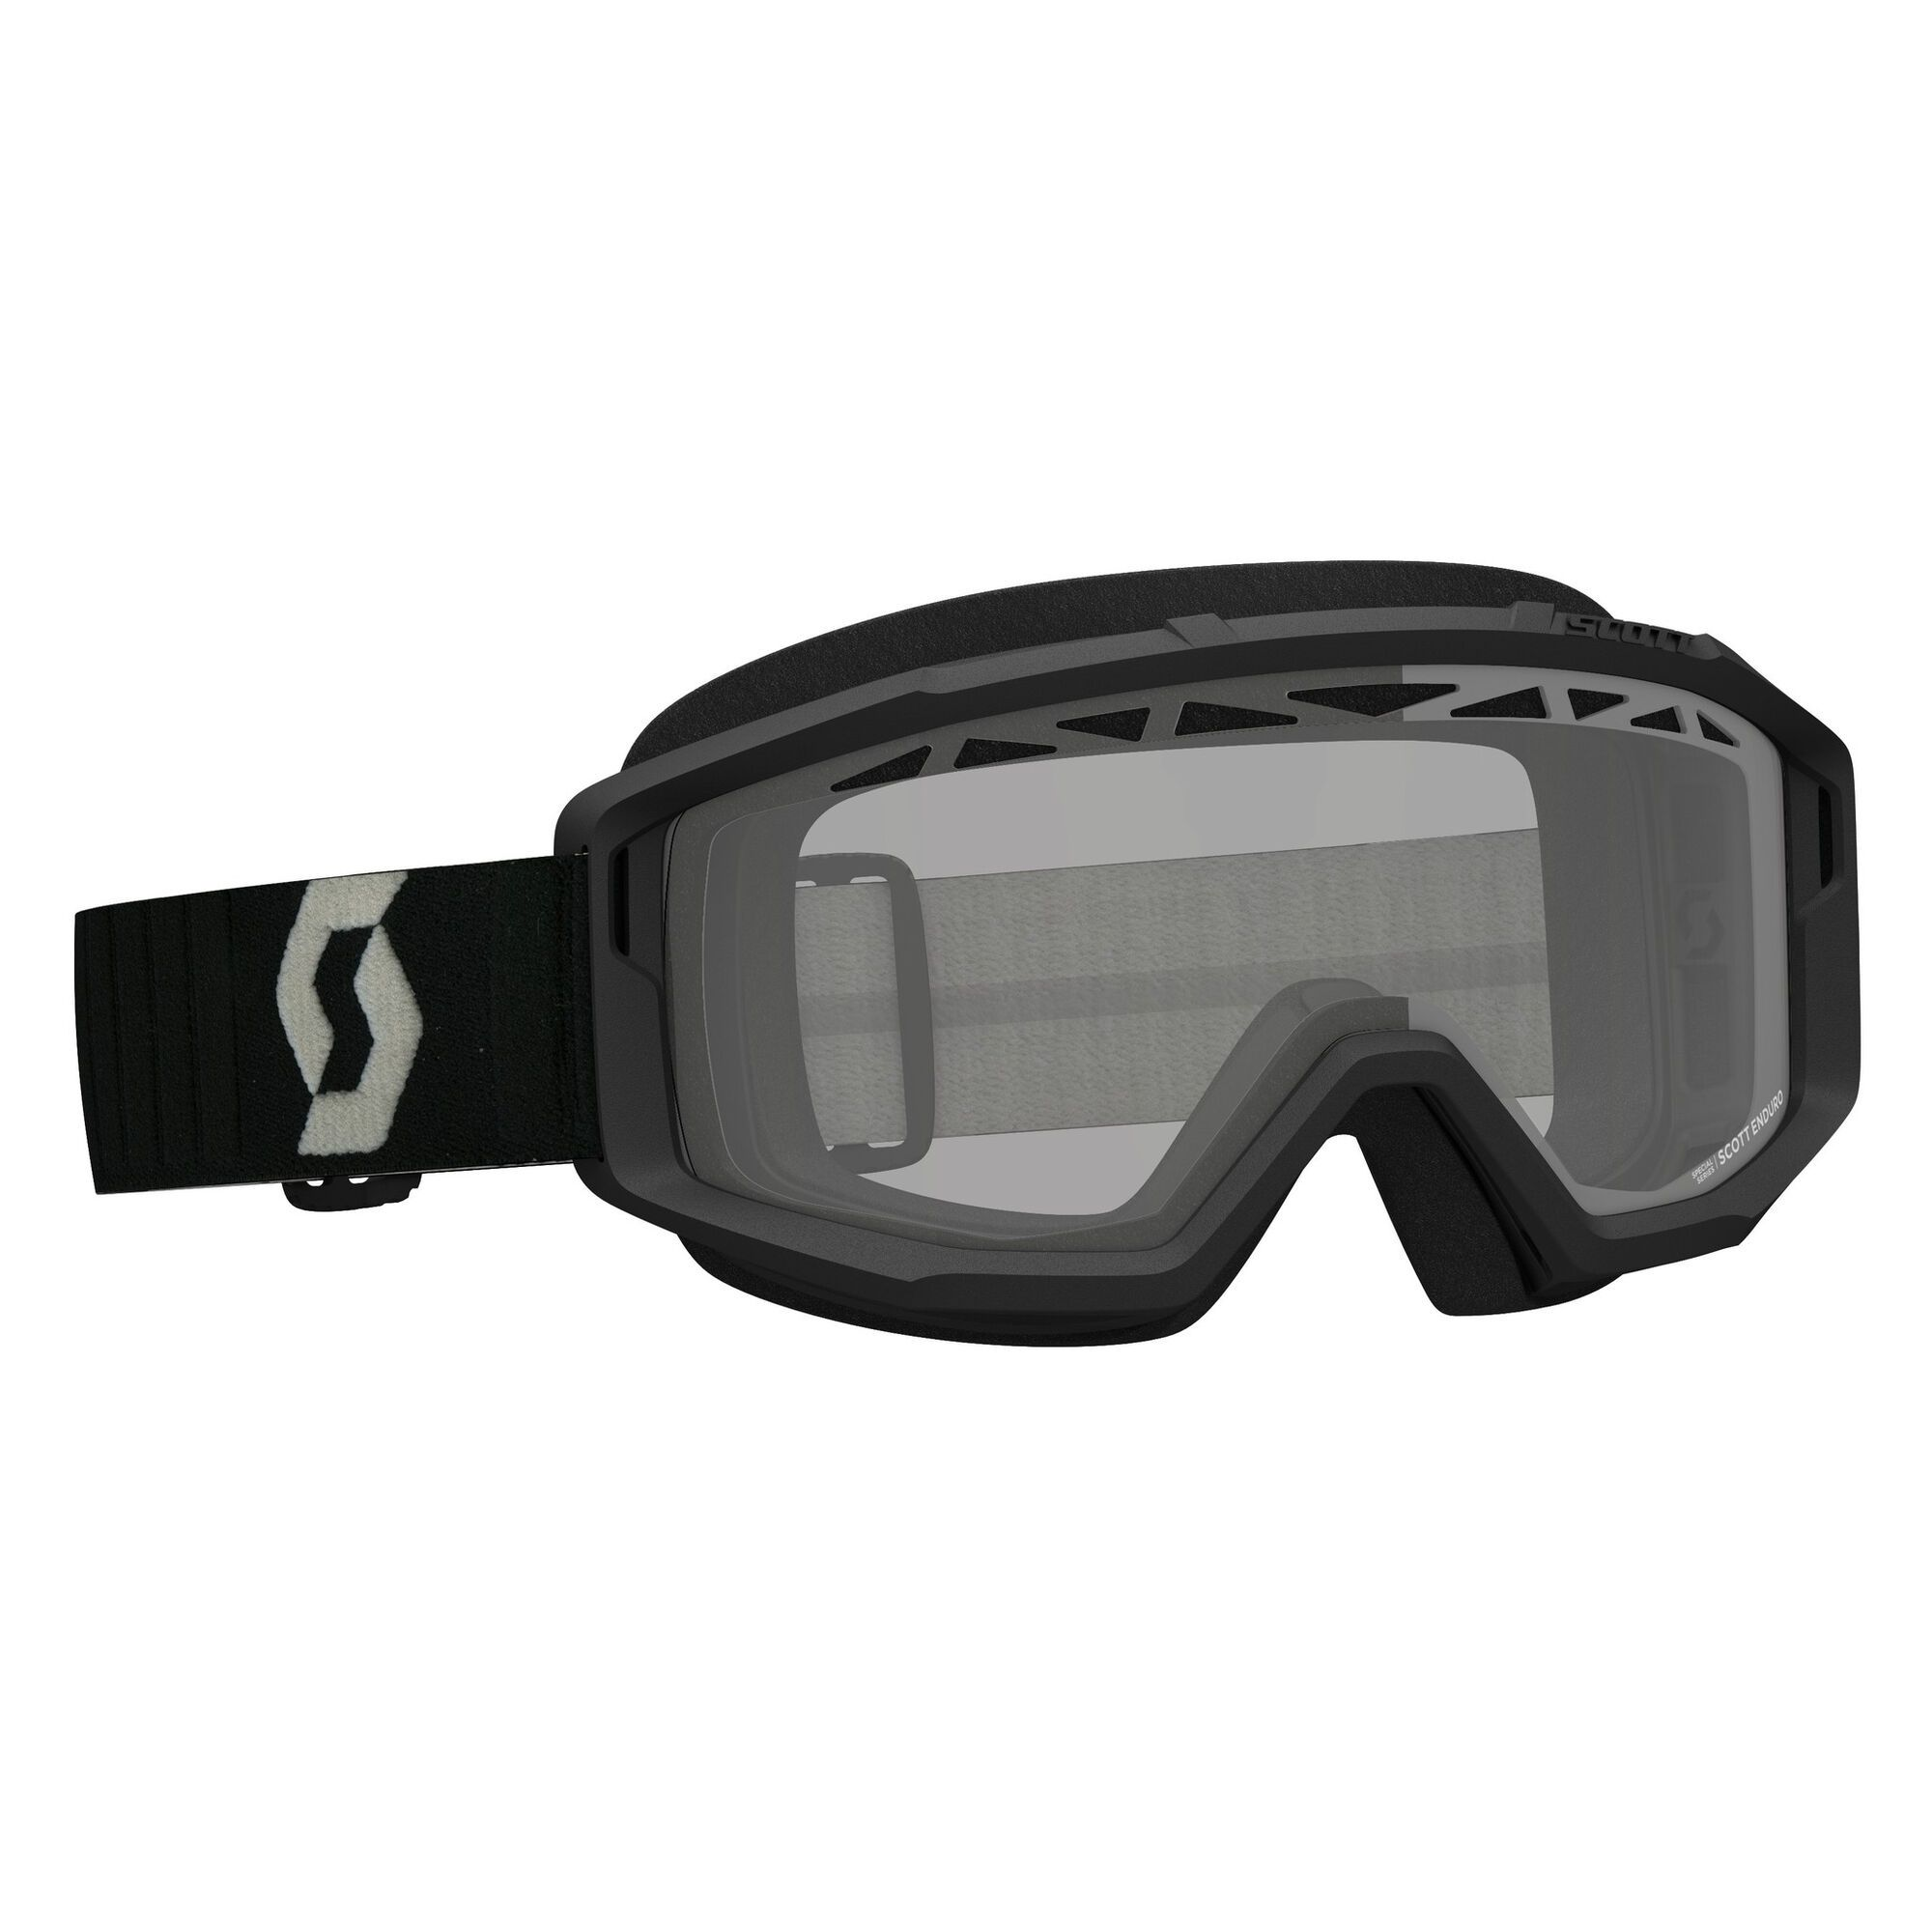 Scott Crossbril Primal Enduro (Double Ventilated Lens) Black/Grey